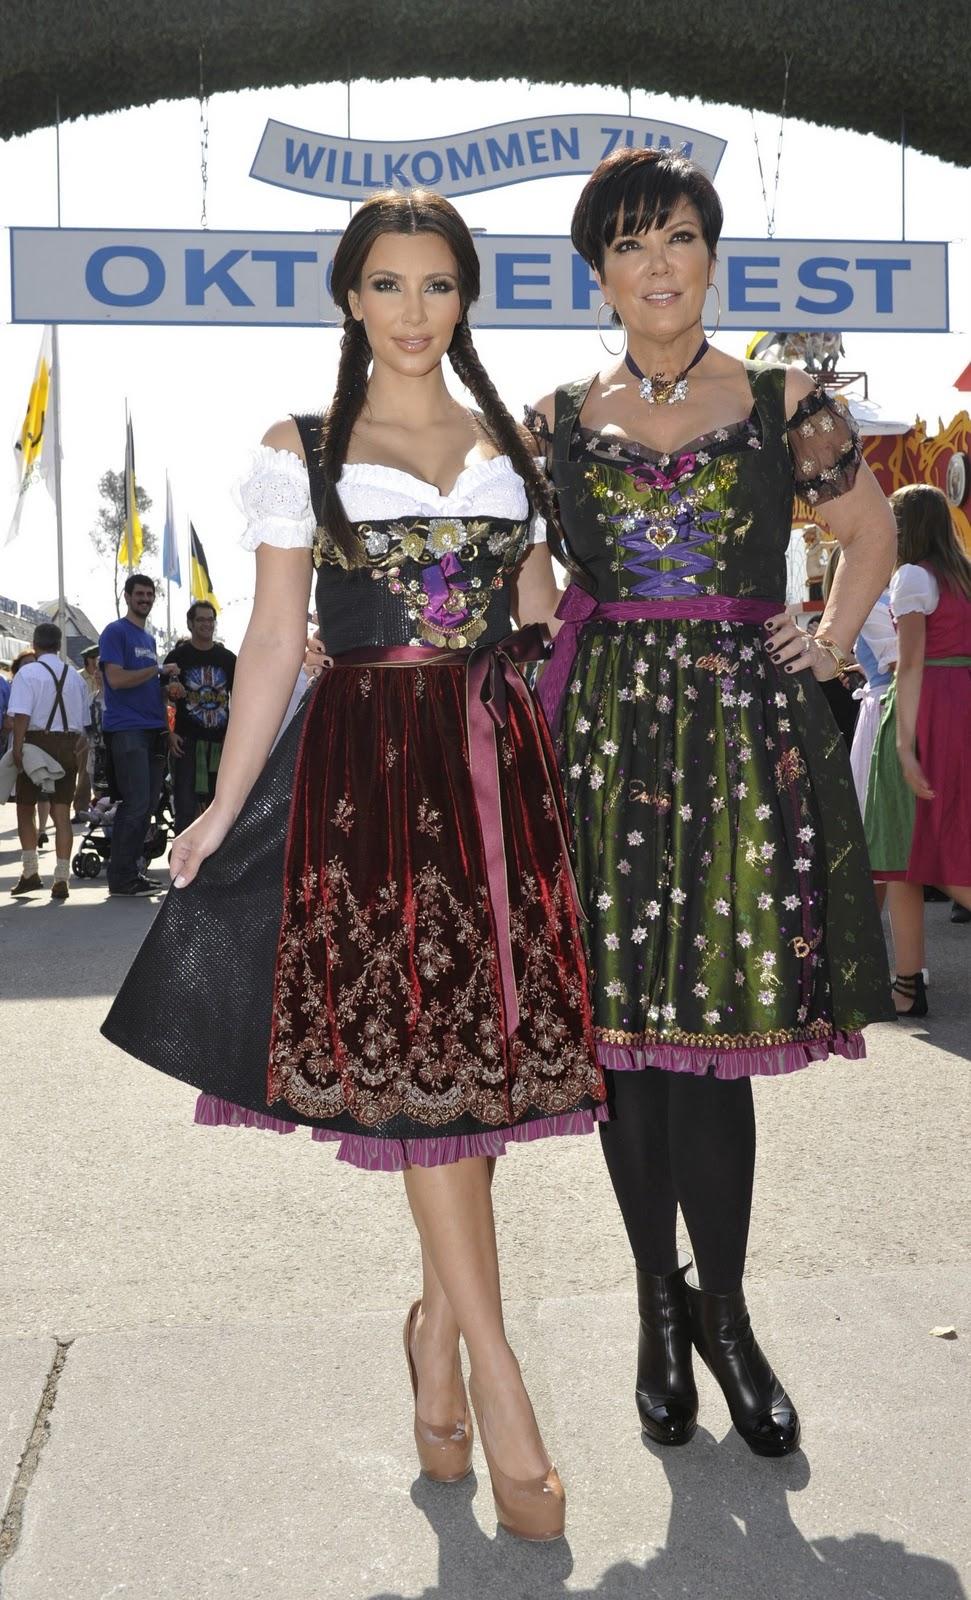 [Kim Kardashian in Munich at Oktoberfest hottest cleavage 6[3].jpg]